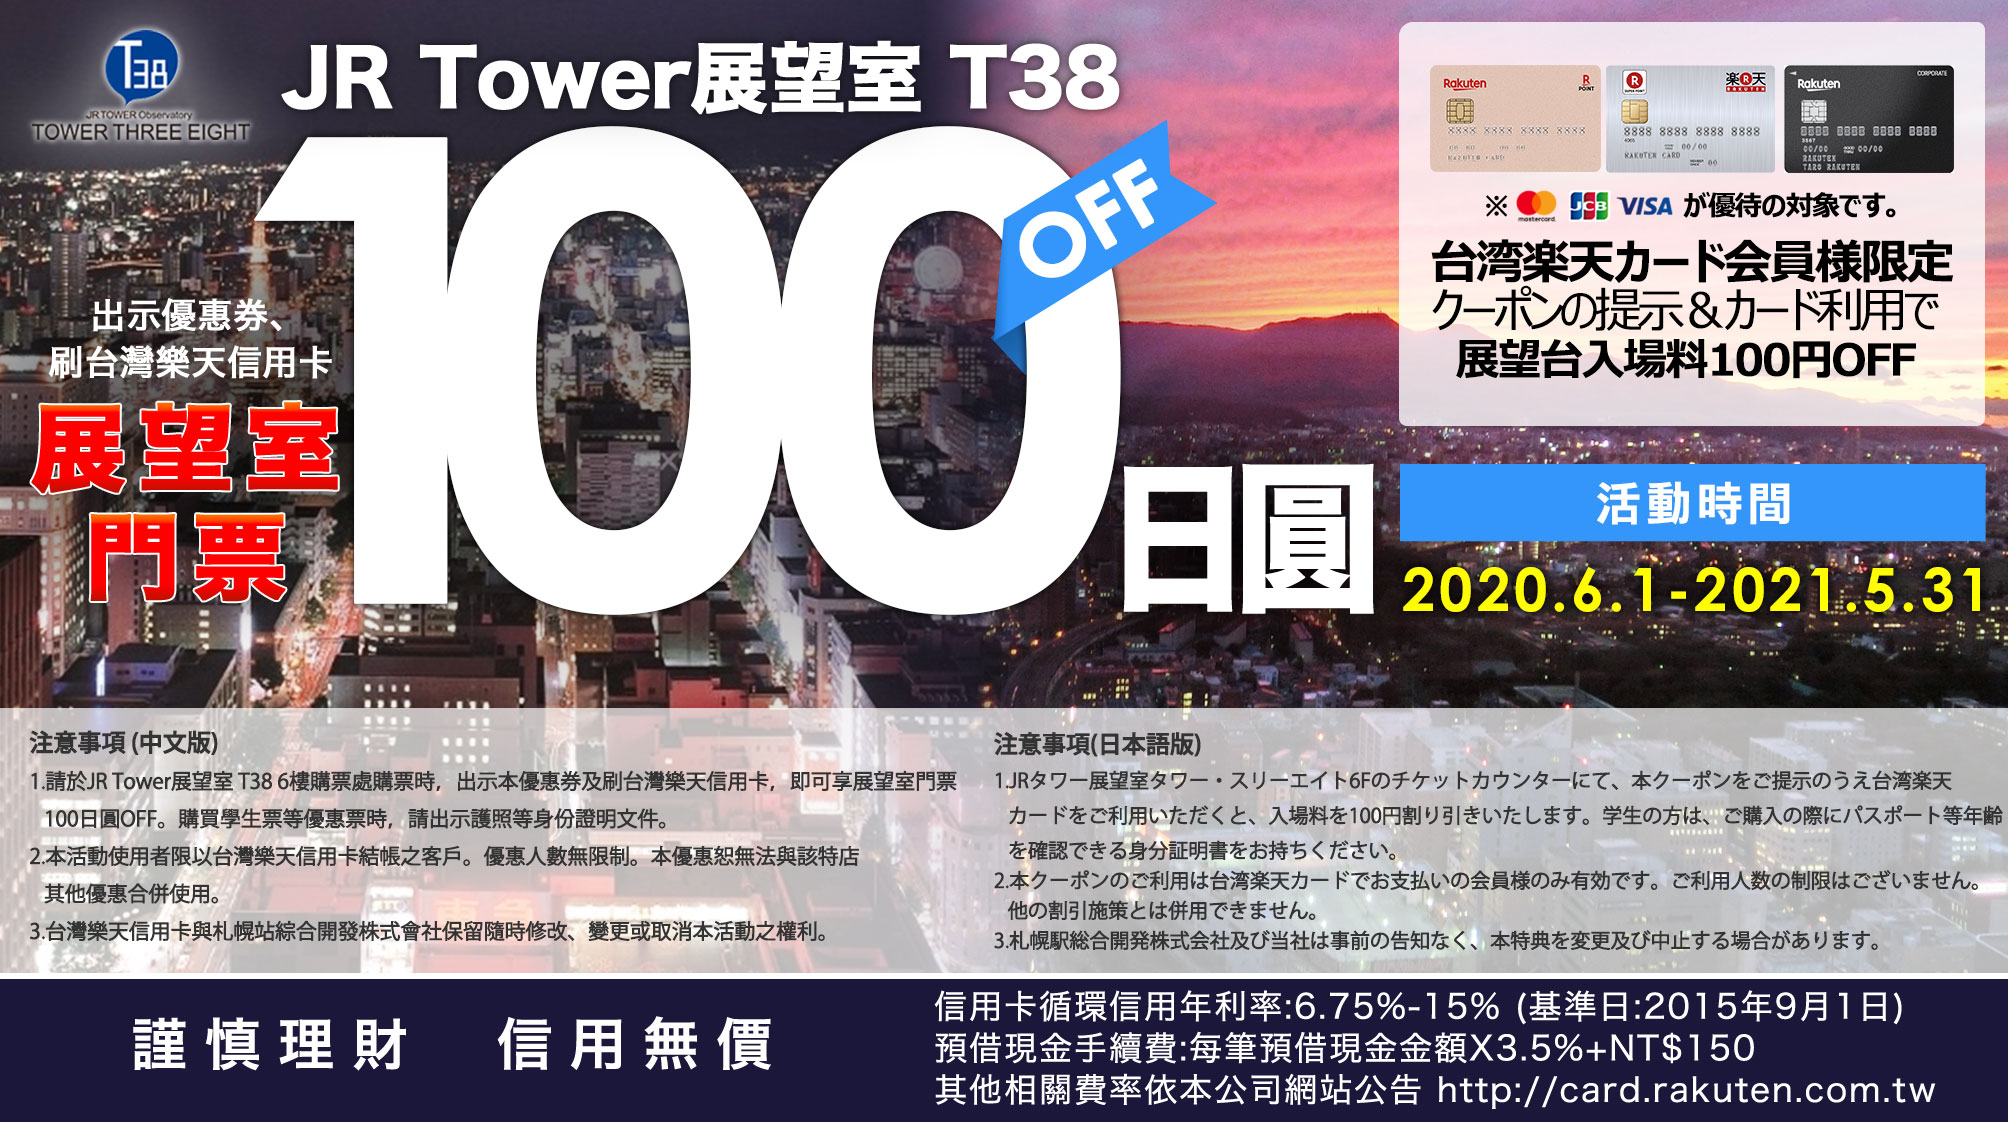 JR Tower展望室T38門票100日圓OFF 360度環繞俯看札幌市